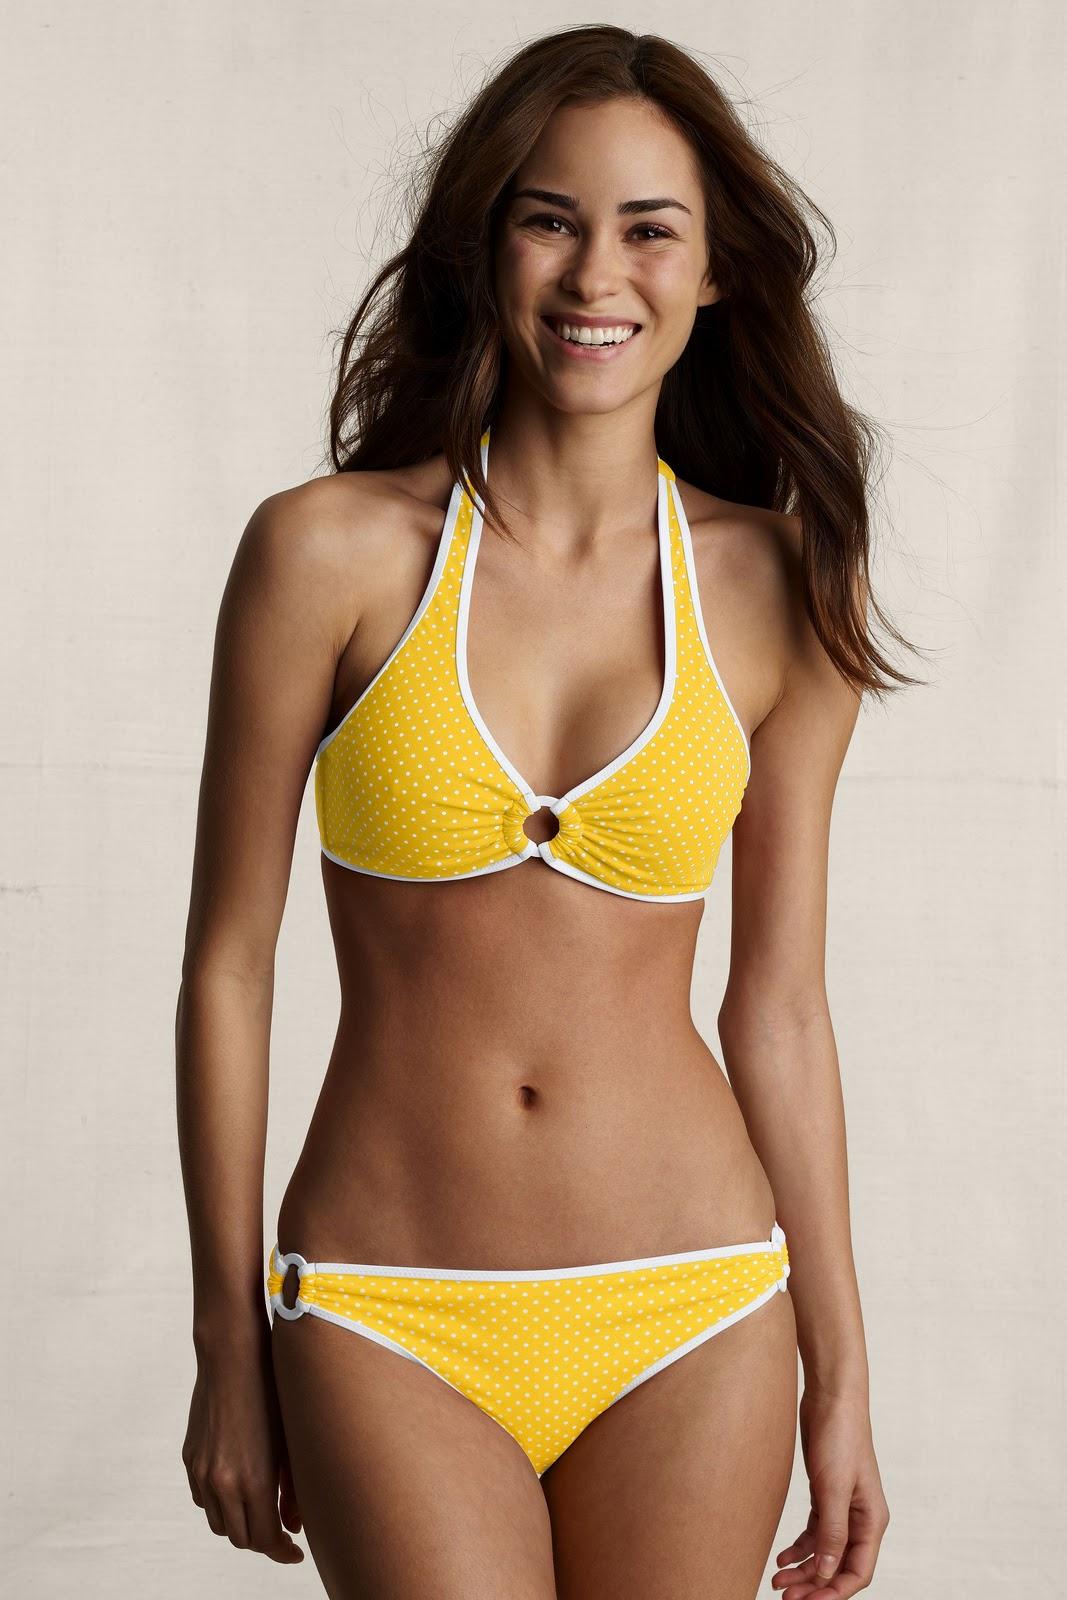 Gabriela Rabelo in a bikini